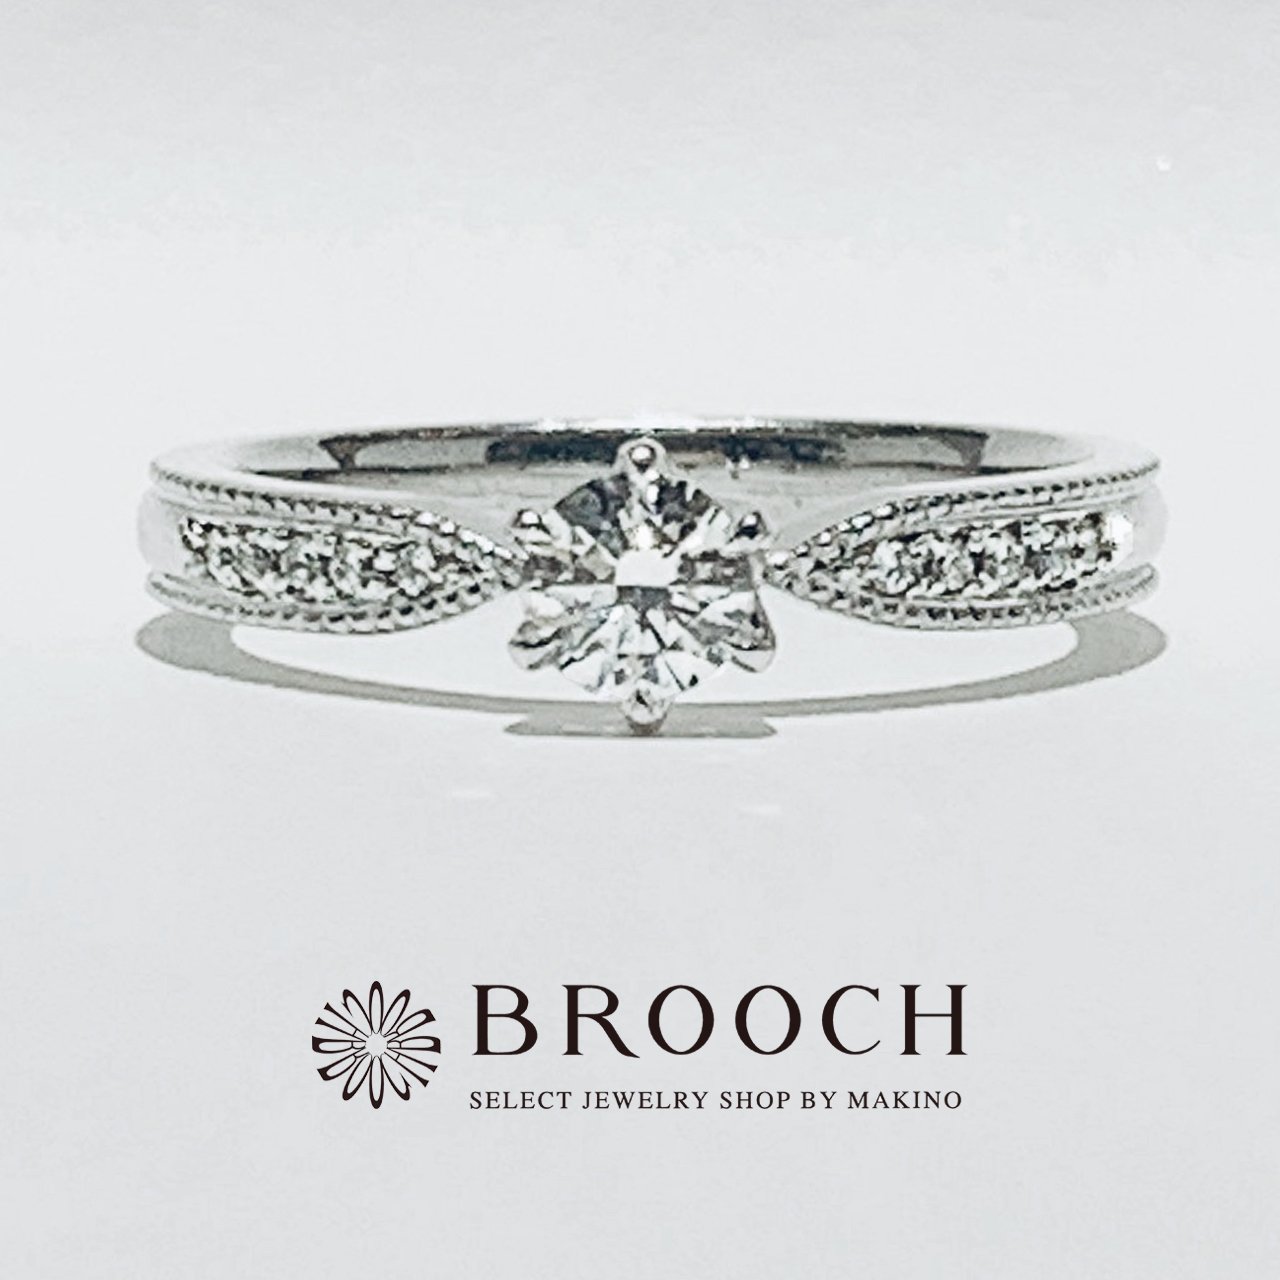 BROOCH 婚約指輪 エンゲージリング かわいい 両サイドメレ ミル打ちデザイン